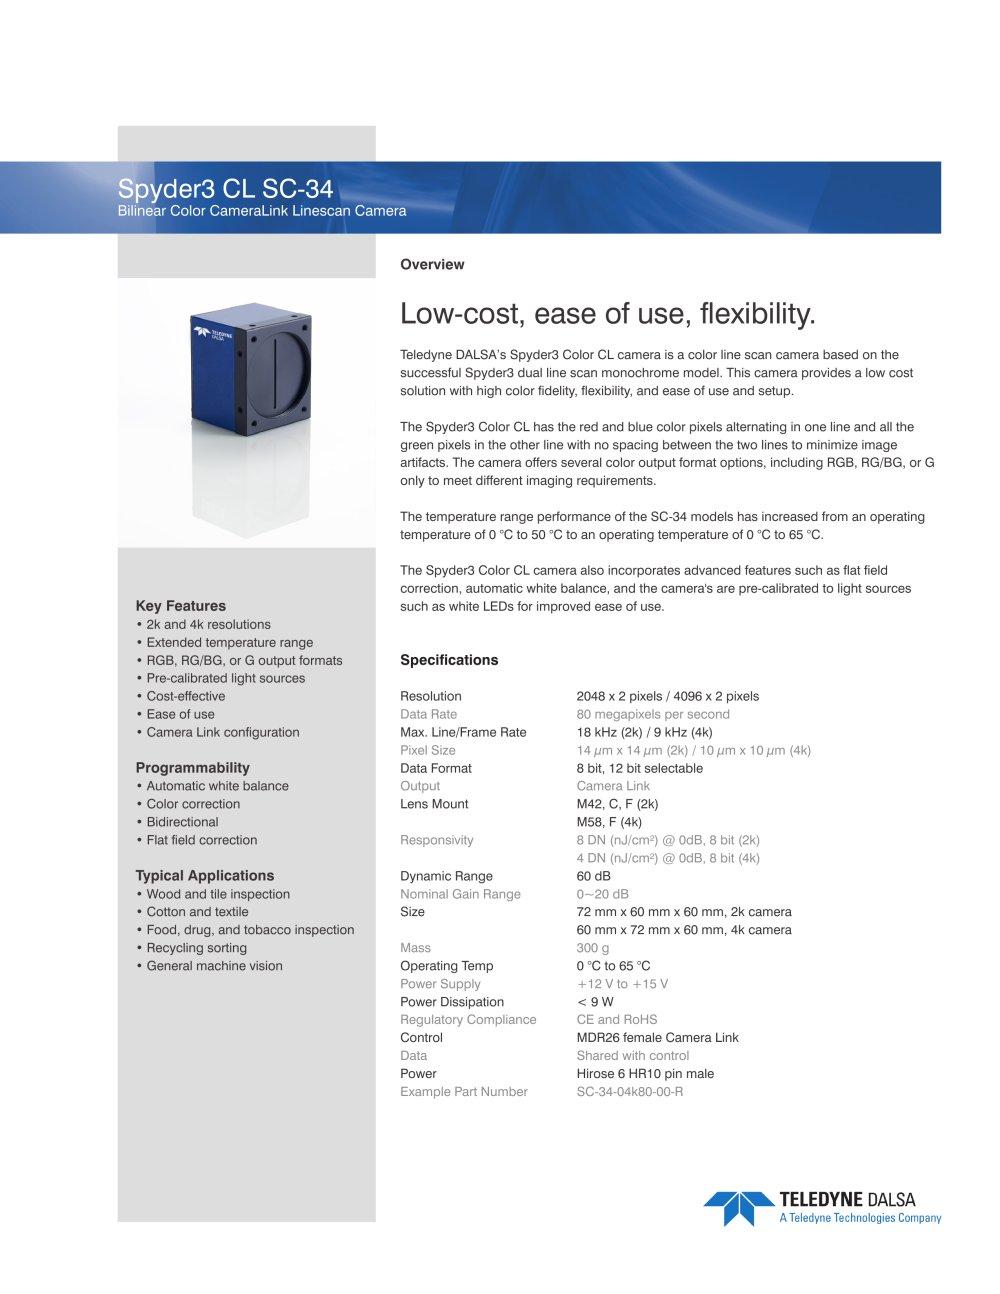 Spyder3 Color CL - Teledyne DALSA - PDF Catalogue | Technical ...